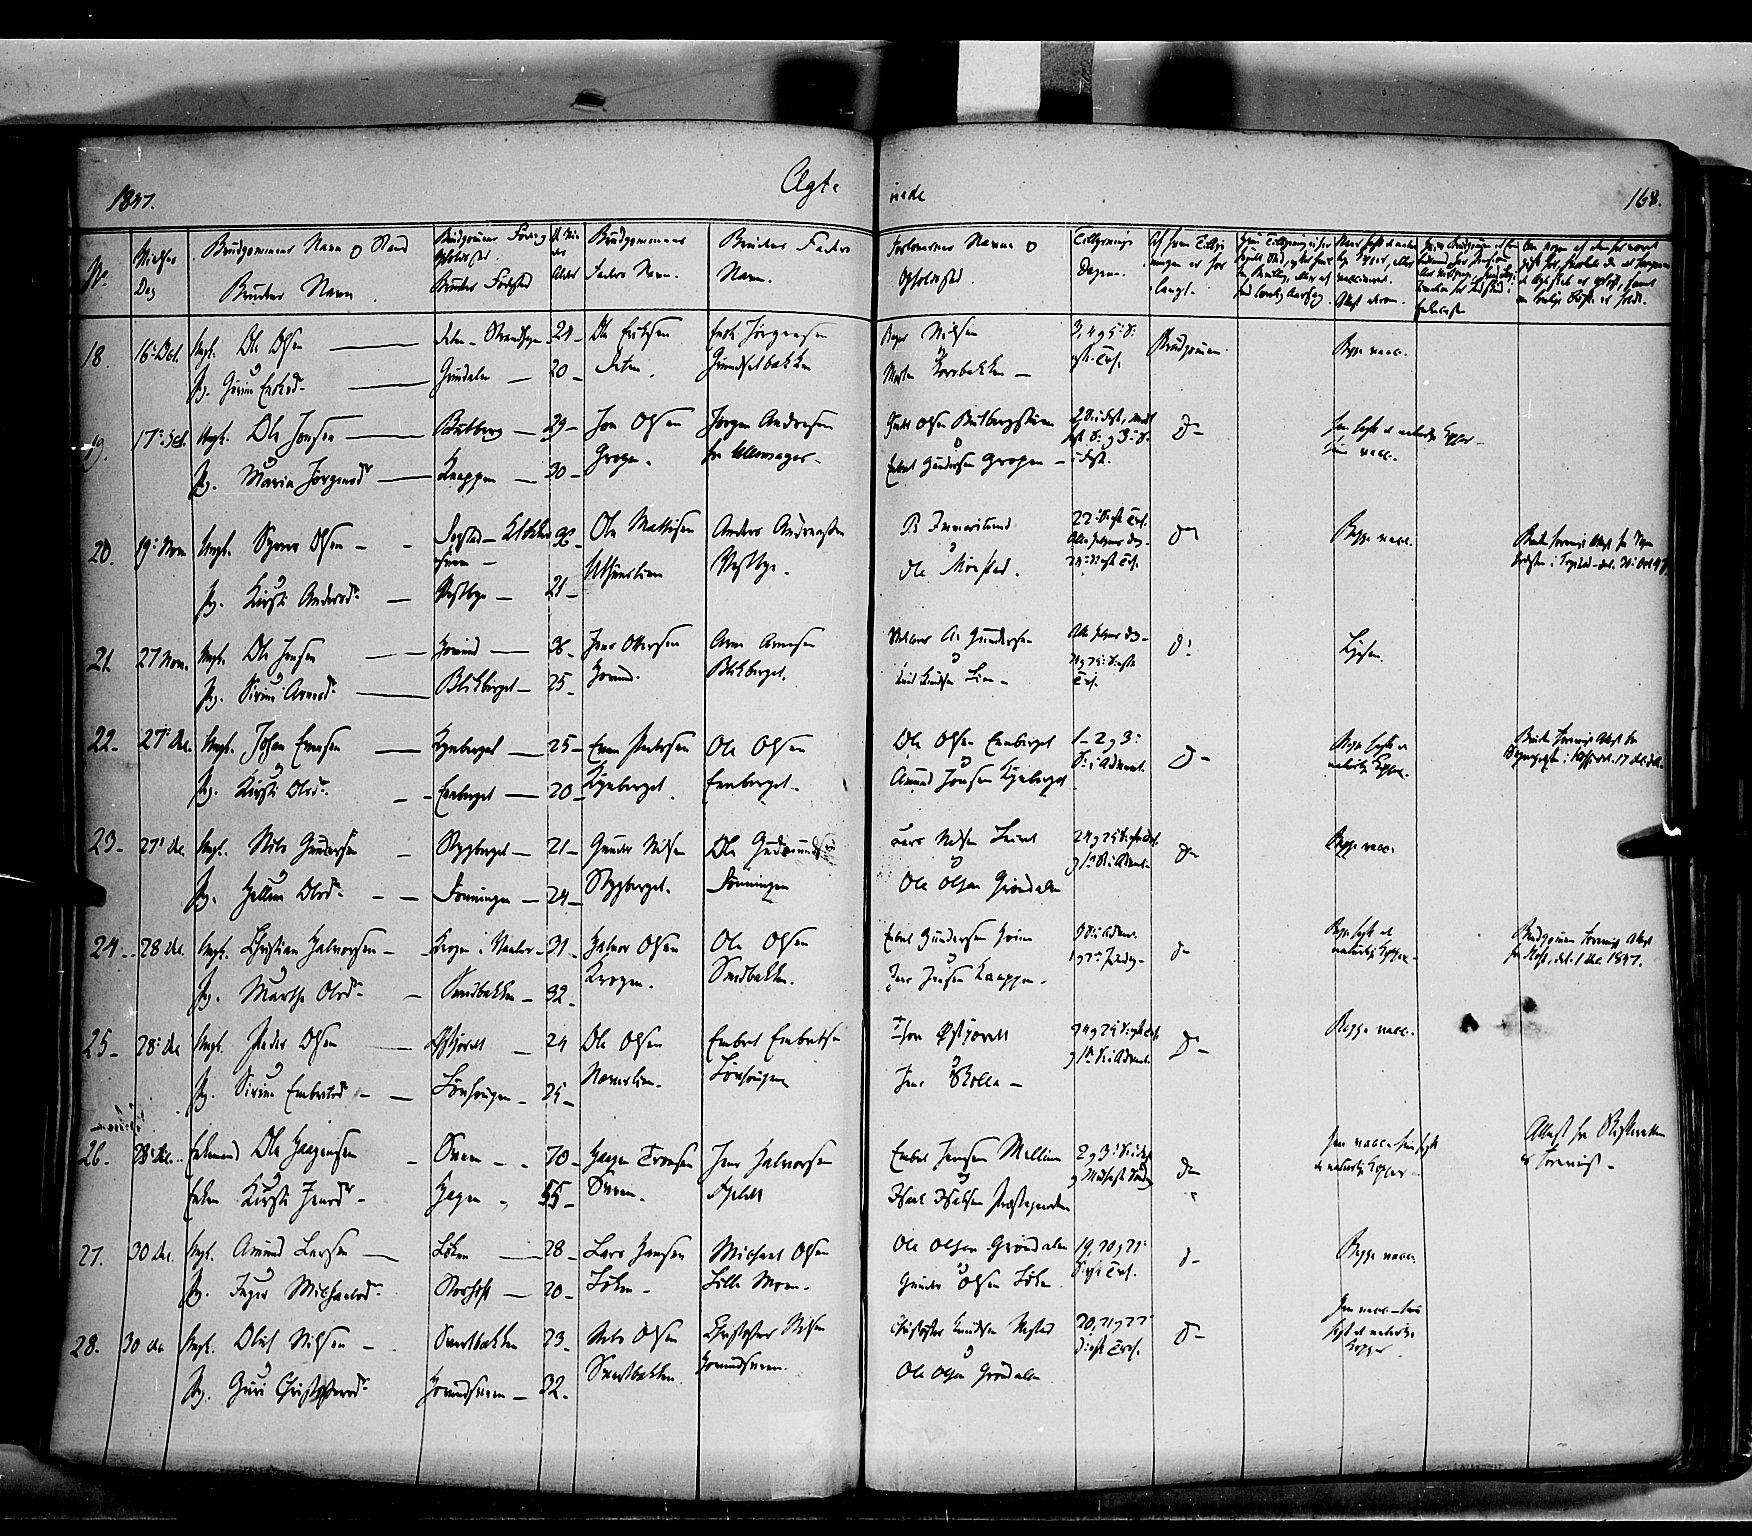 SAH, Elverum prestekontor, H/Ha/Haa/L0009: Ministerialbok nr. 9, 1843-1856, s. 168